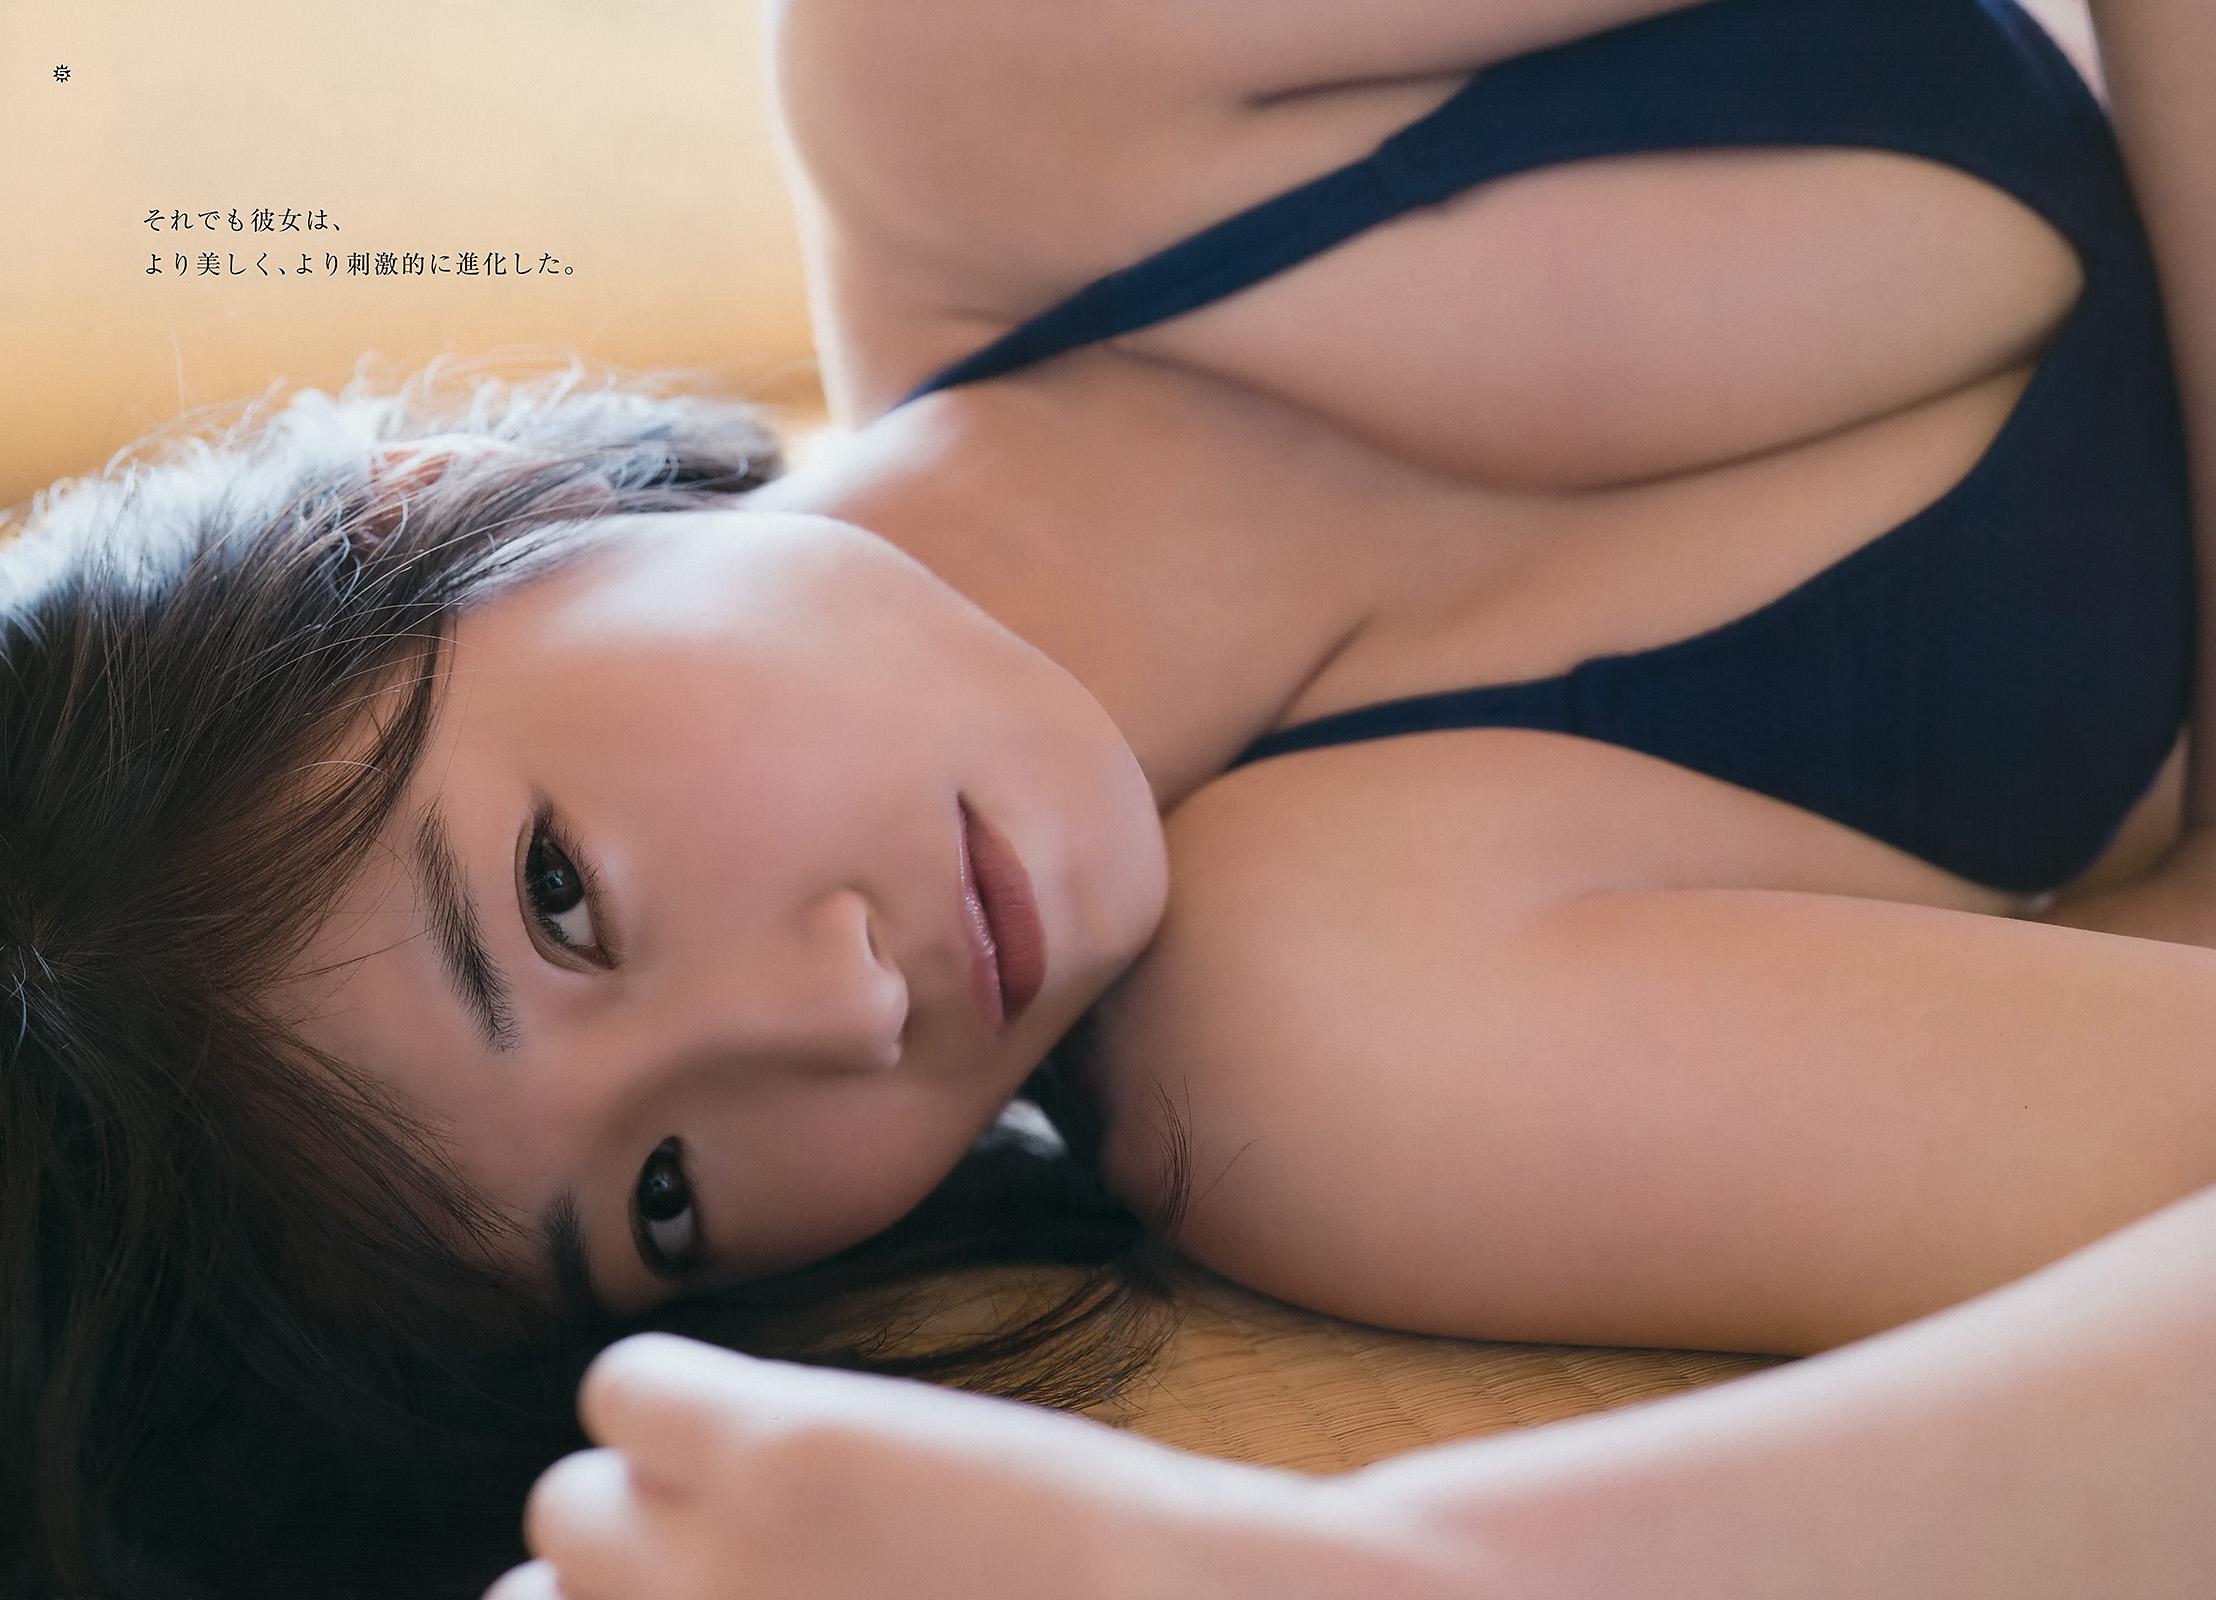 HKT48朝長美桜(19)の水着グラビア、キャバ嬢姿のエロ画像50枚・35枚目の画像